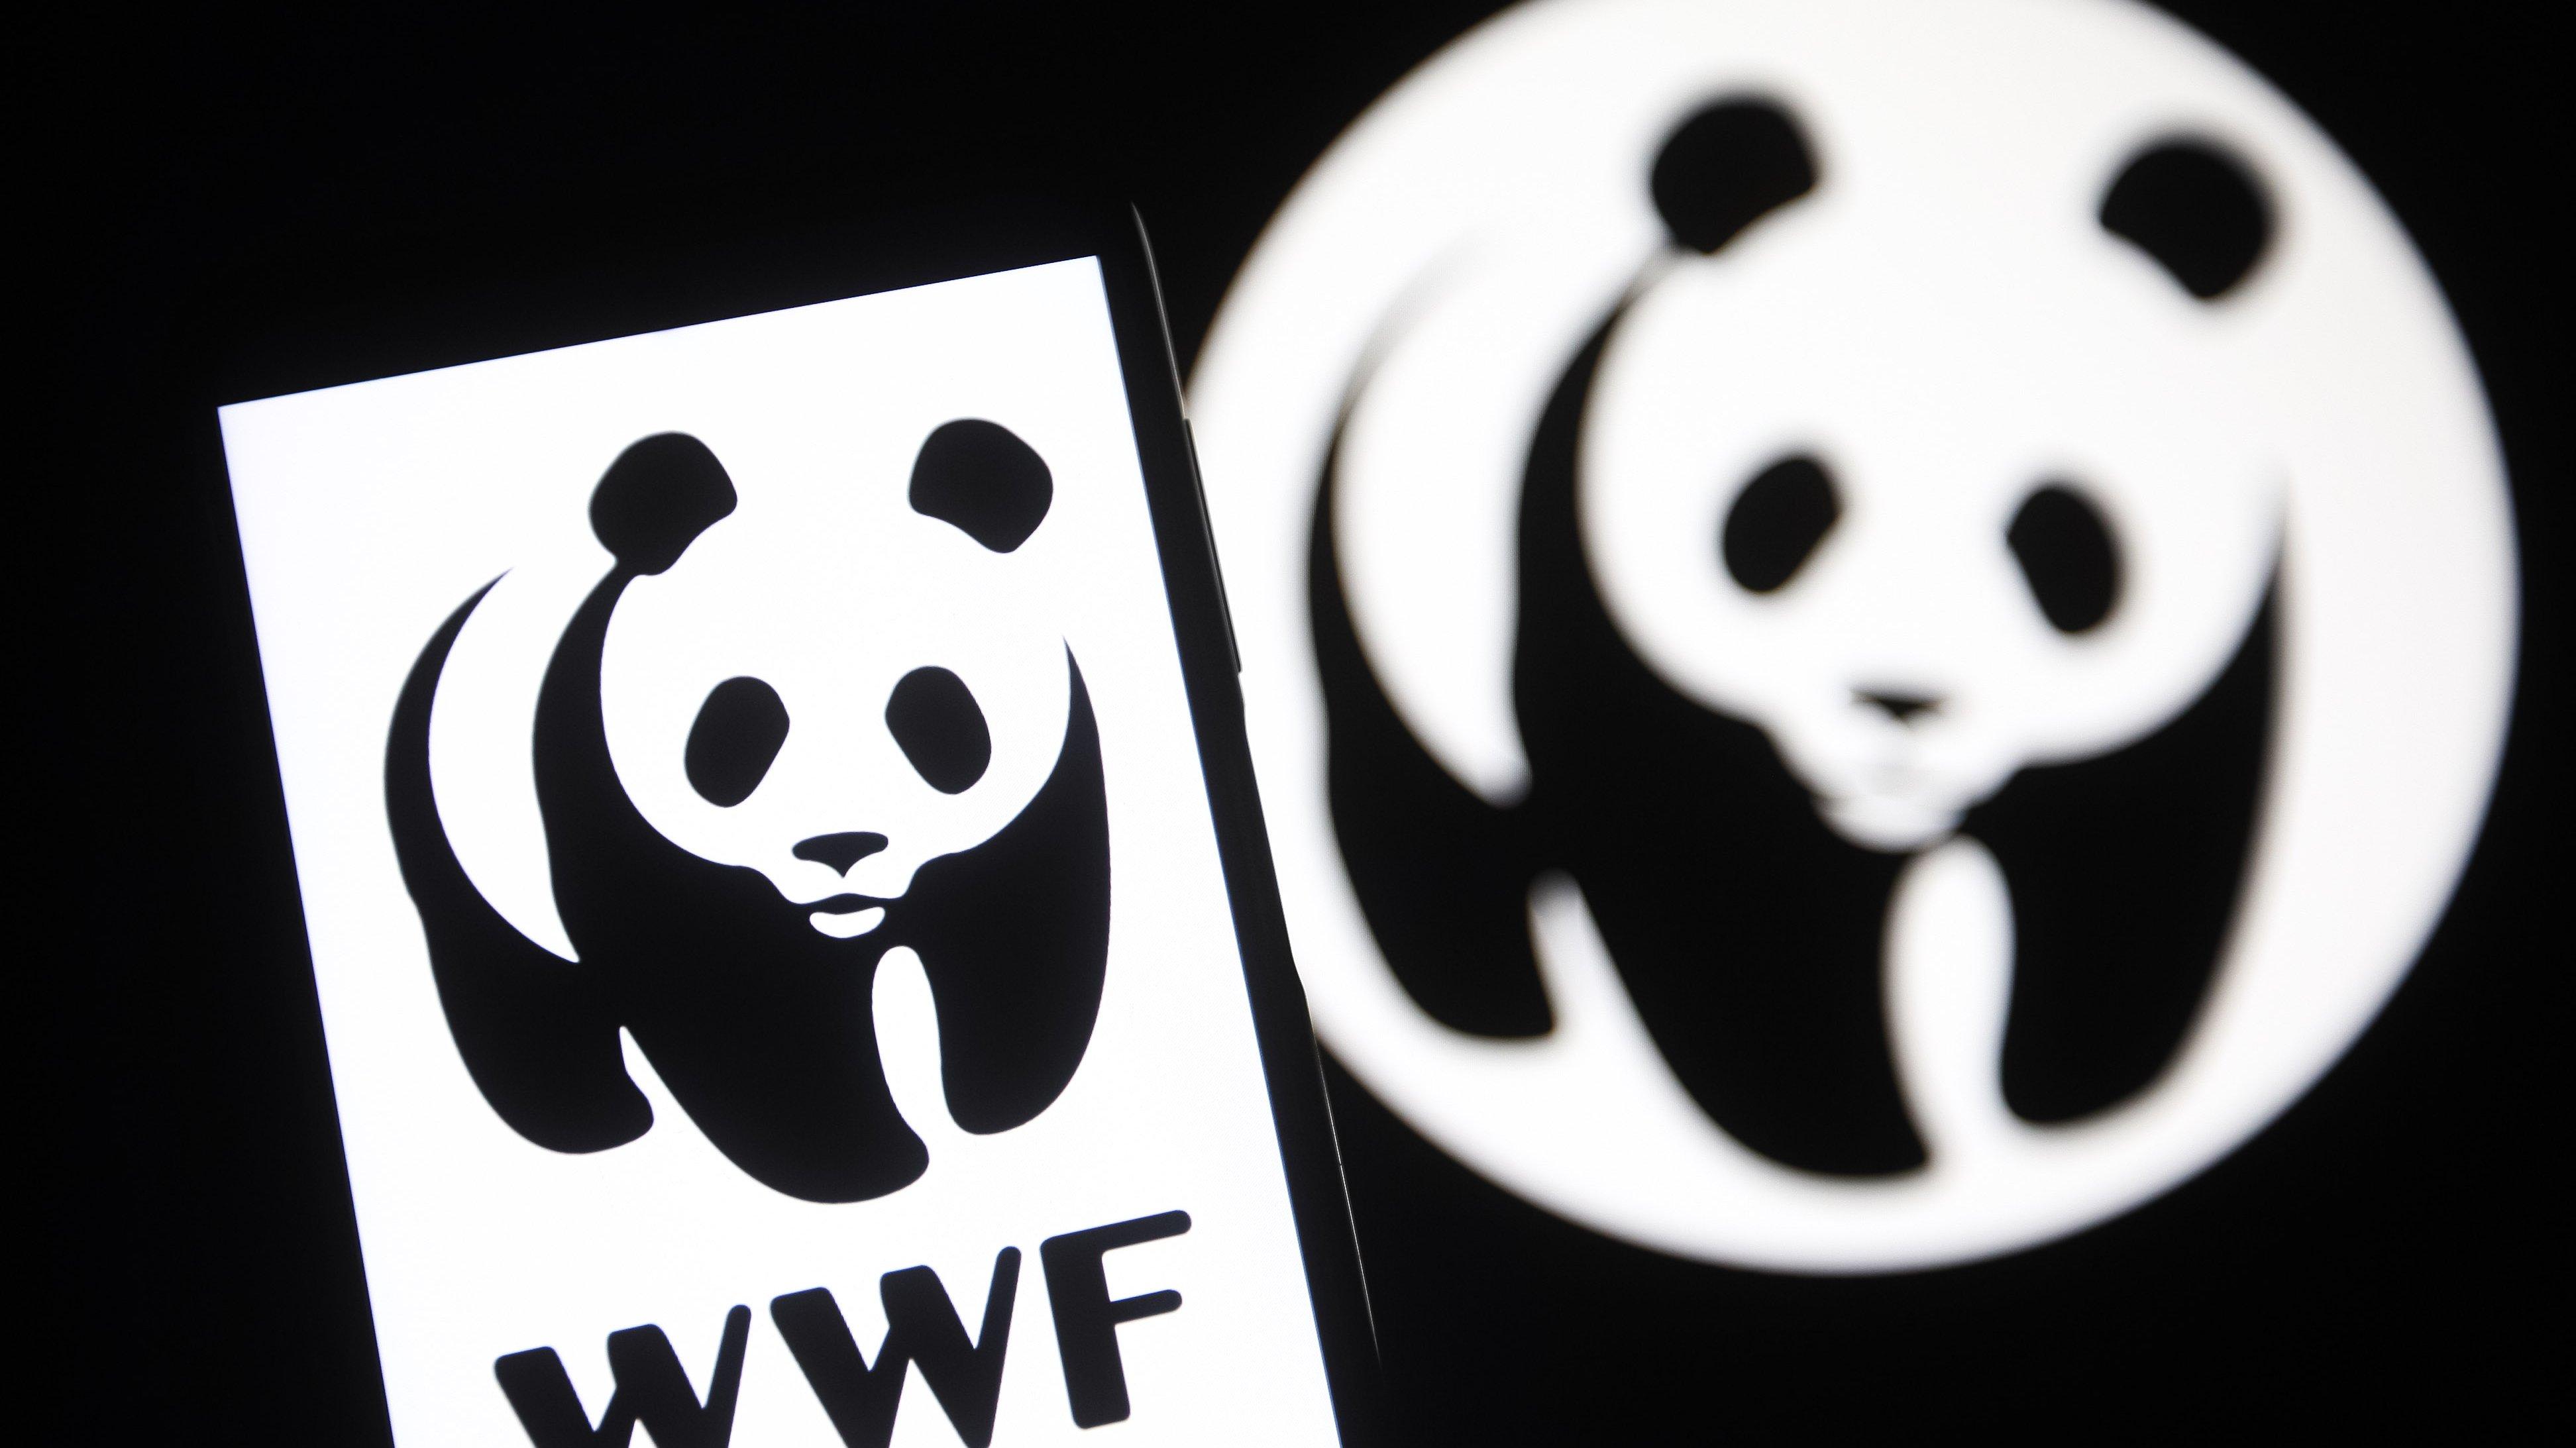 WWF Logótipo